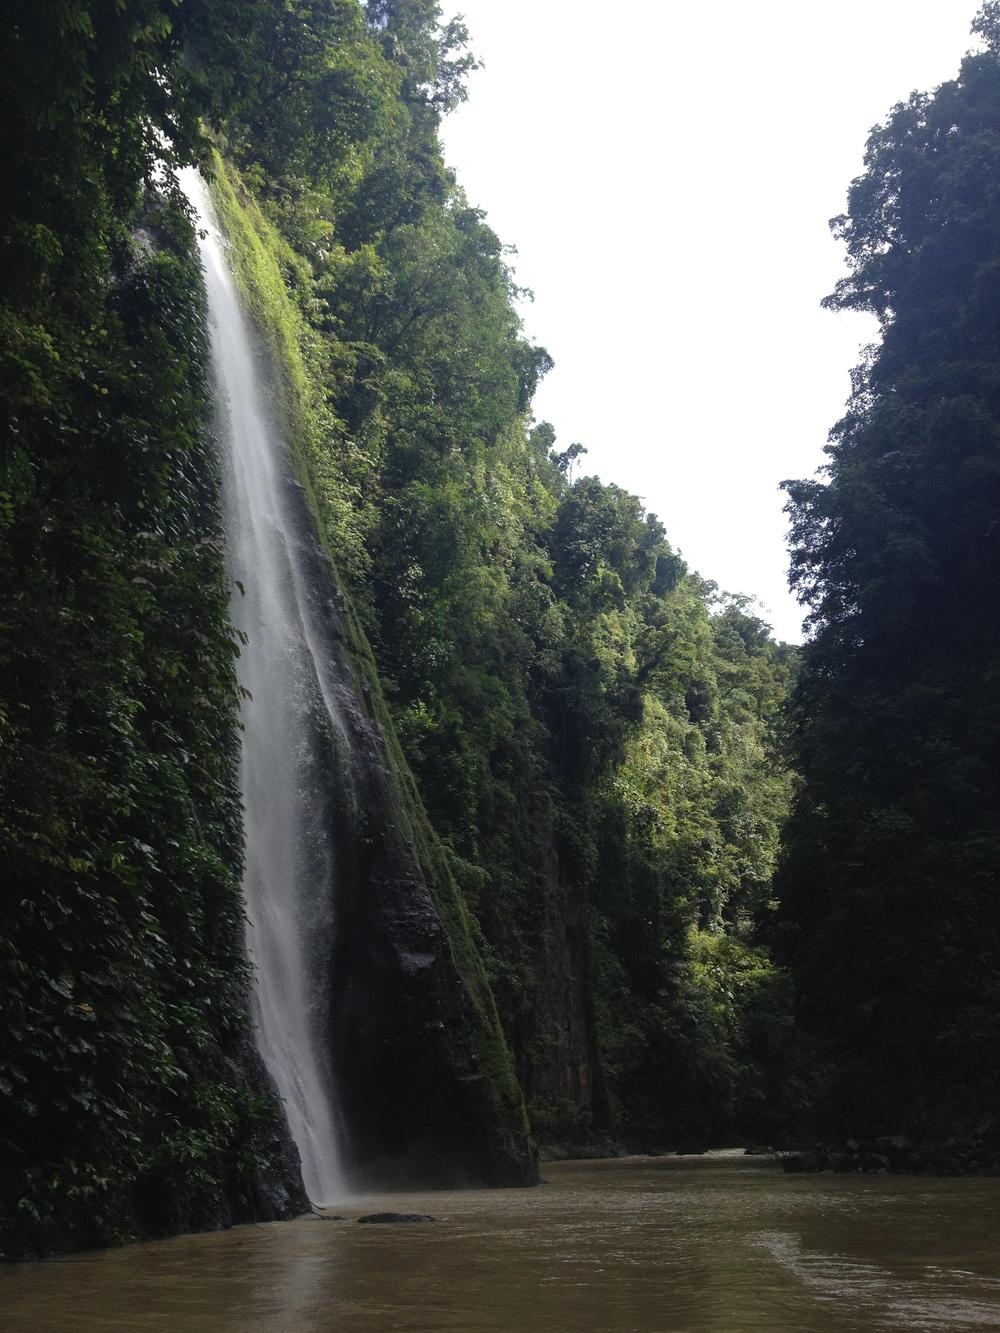 the beautiful talahib falls and pagsanjan gorge.